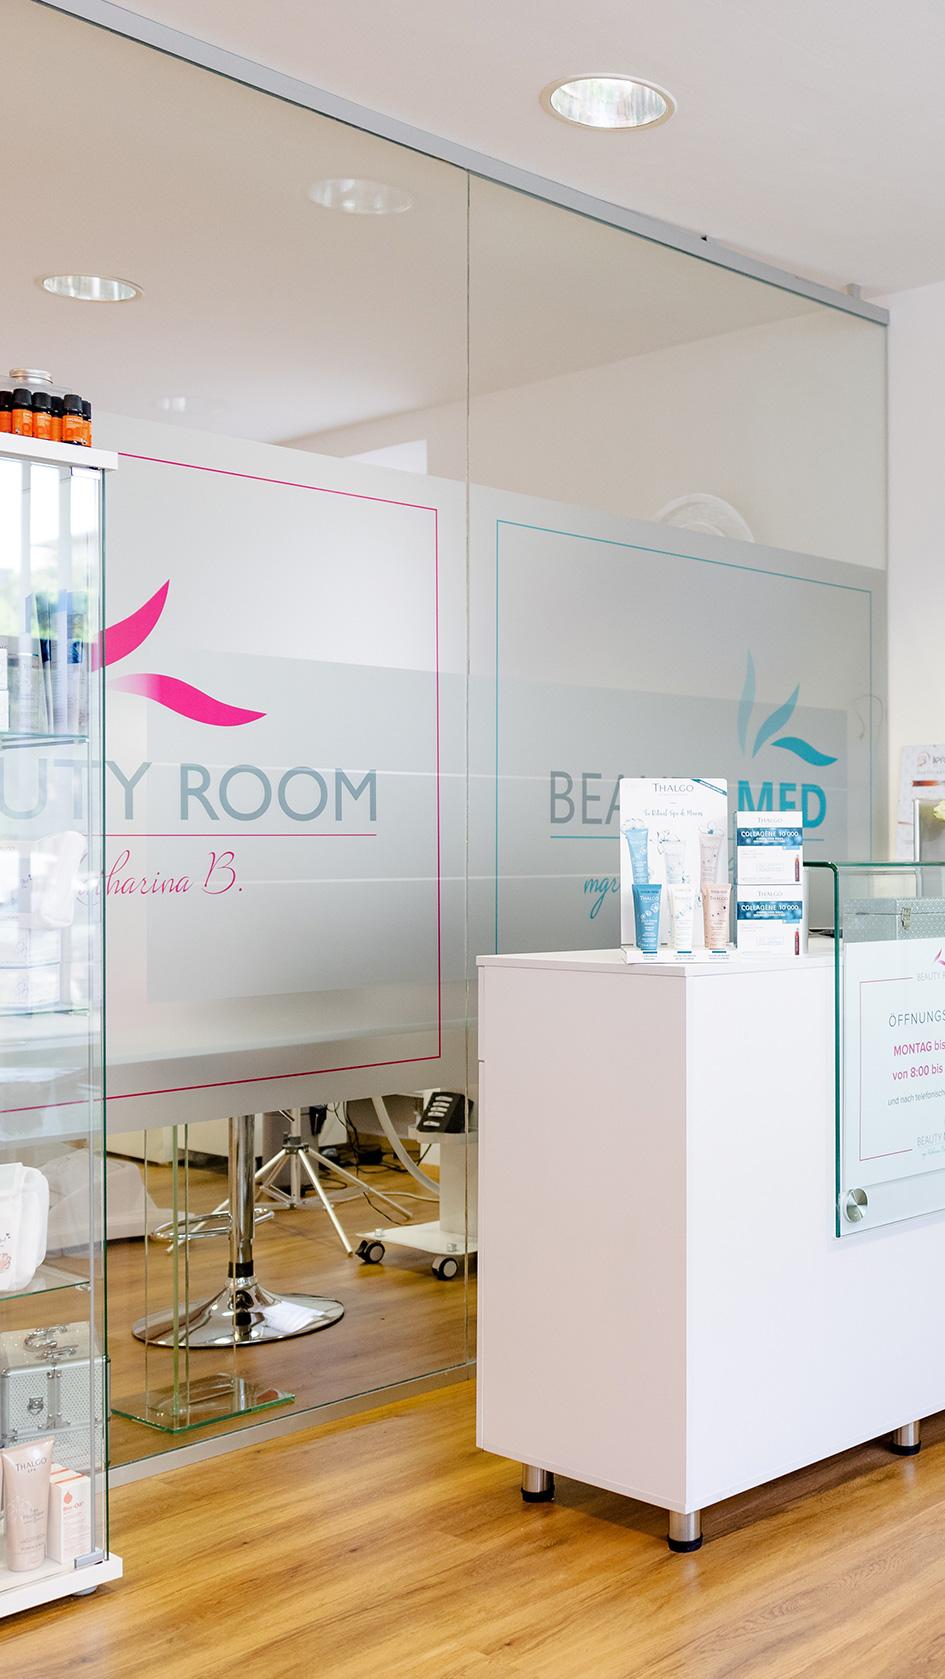 beauty-room-website-home-studio-mobile